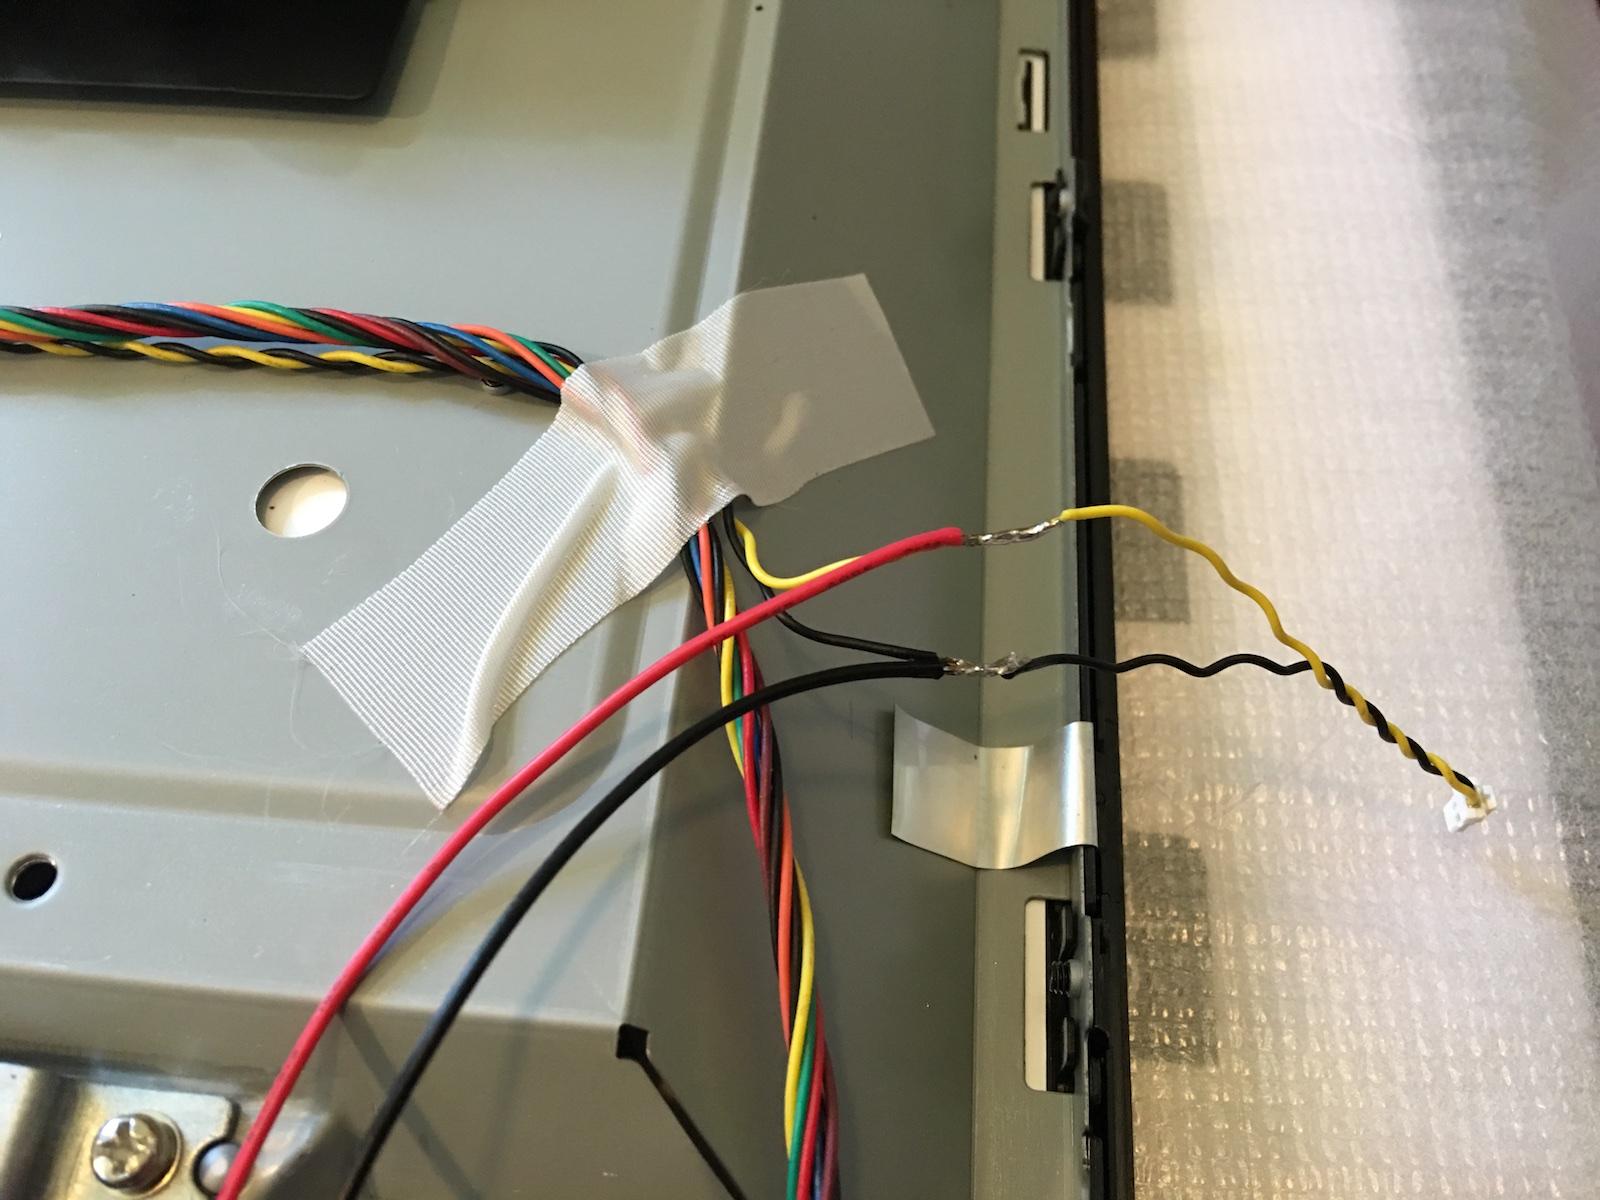 Alpha Bravo Pinball Maintenance Repair Restoration Wiring Jamma Power Supply Wires Added Kraylix Powerbuttons 002